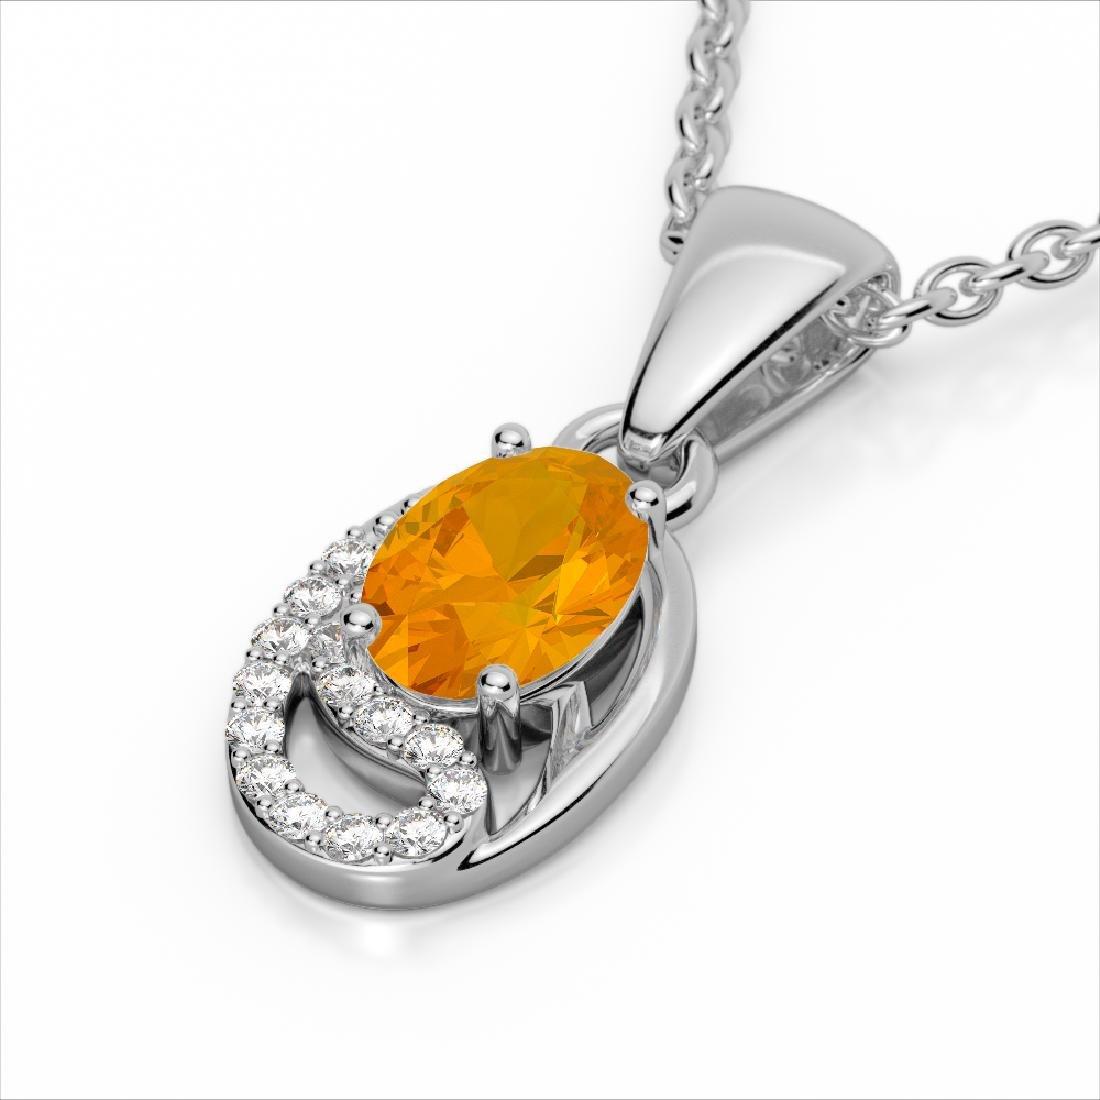 1.25 CTW Citrine & Micro Pave VS/SI Diamond Necklace